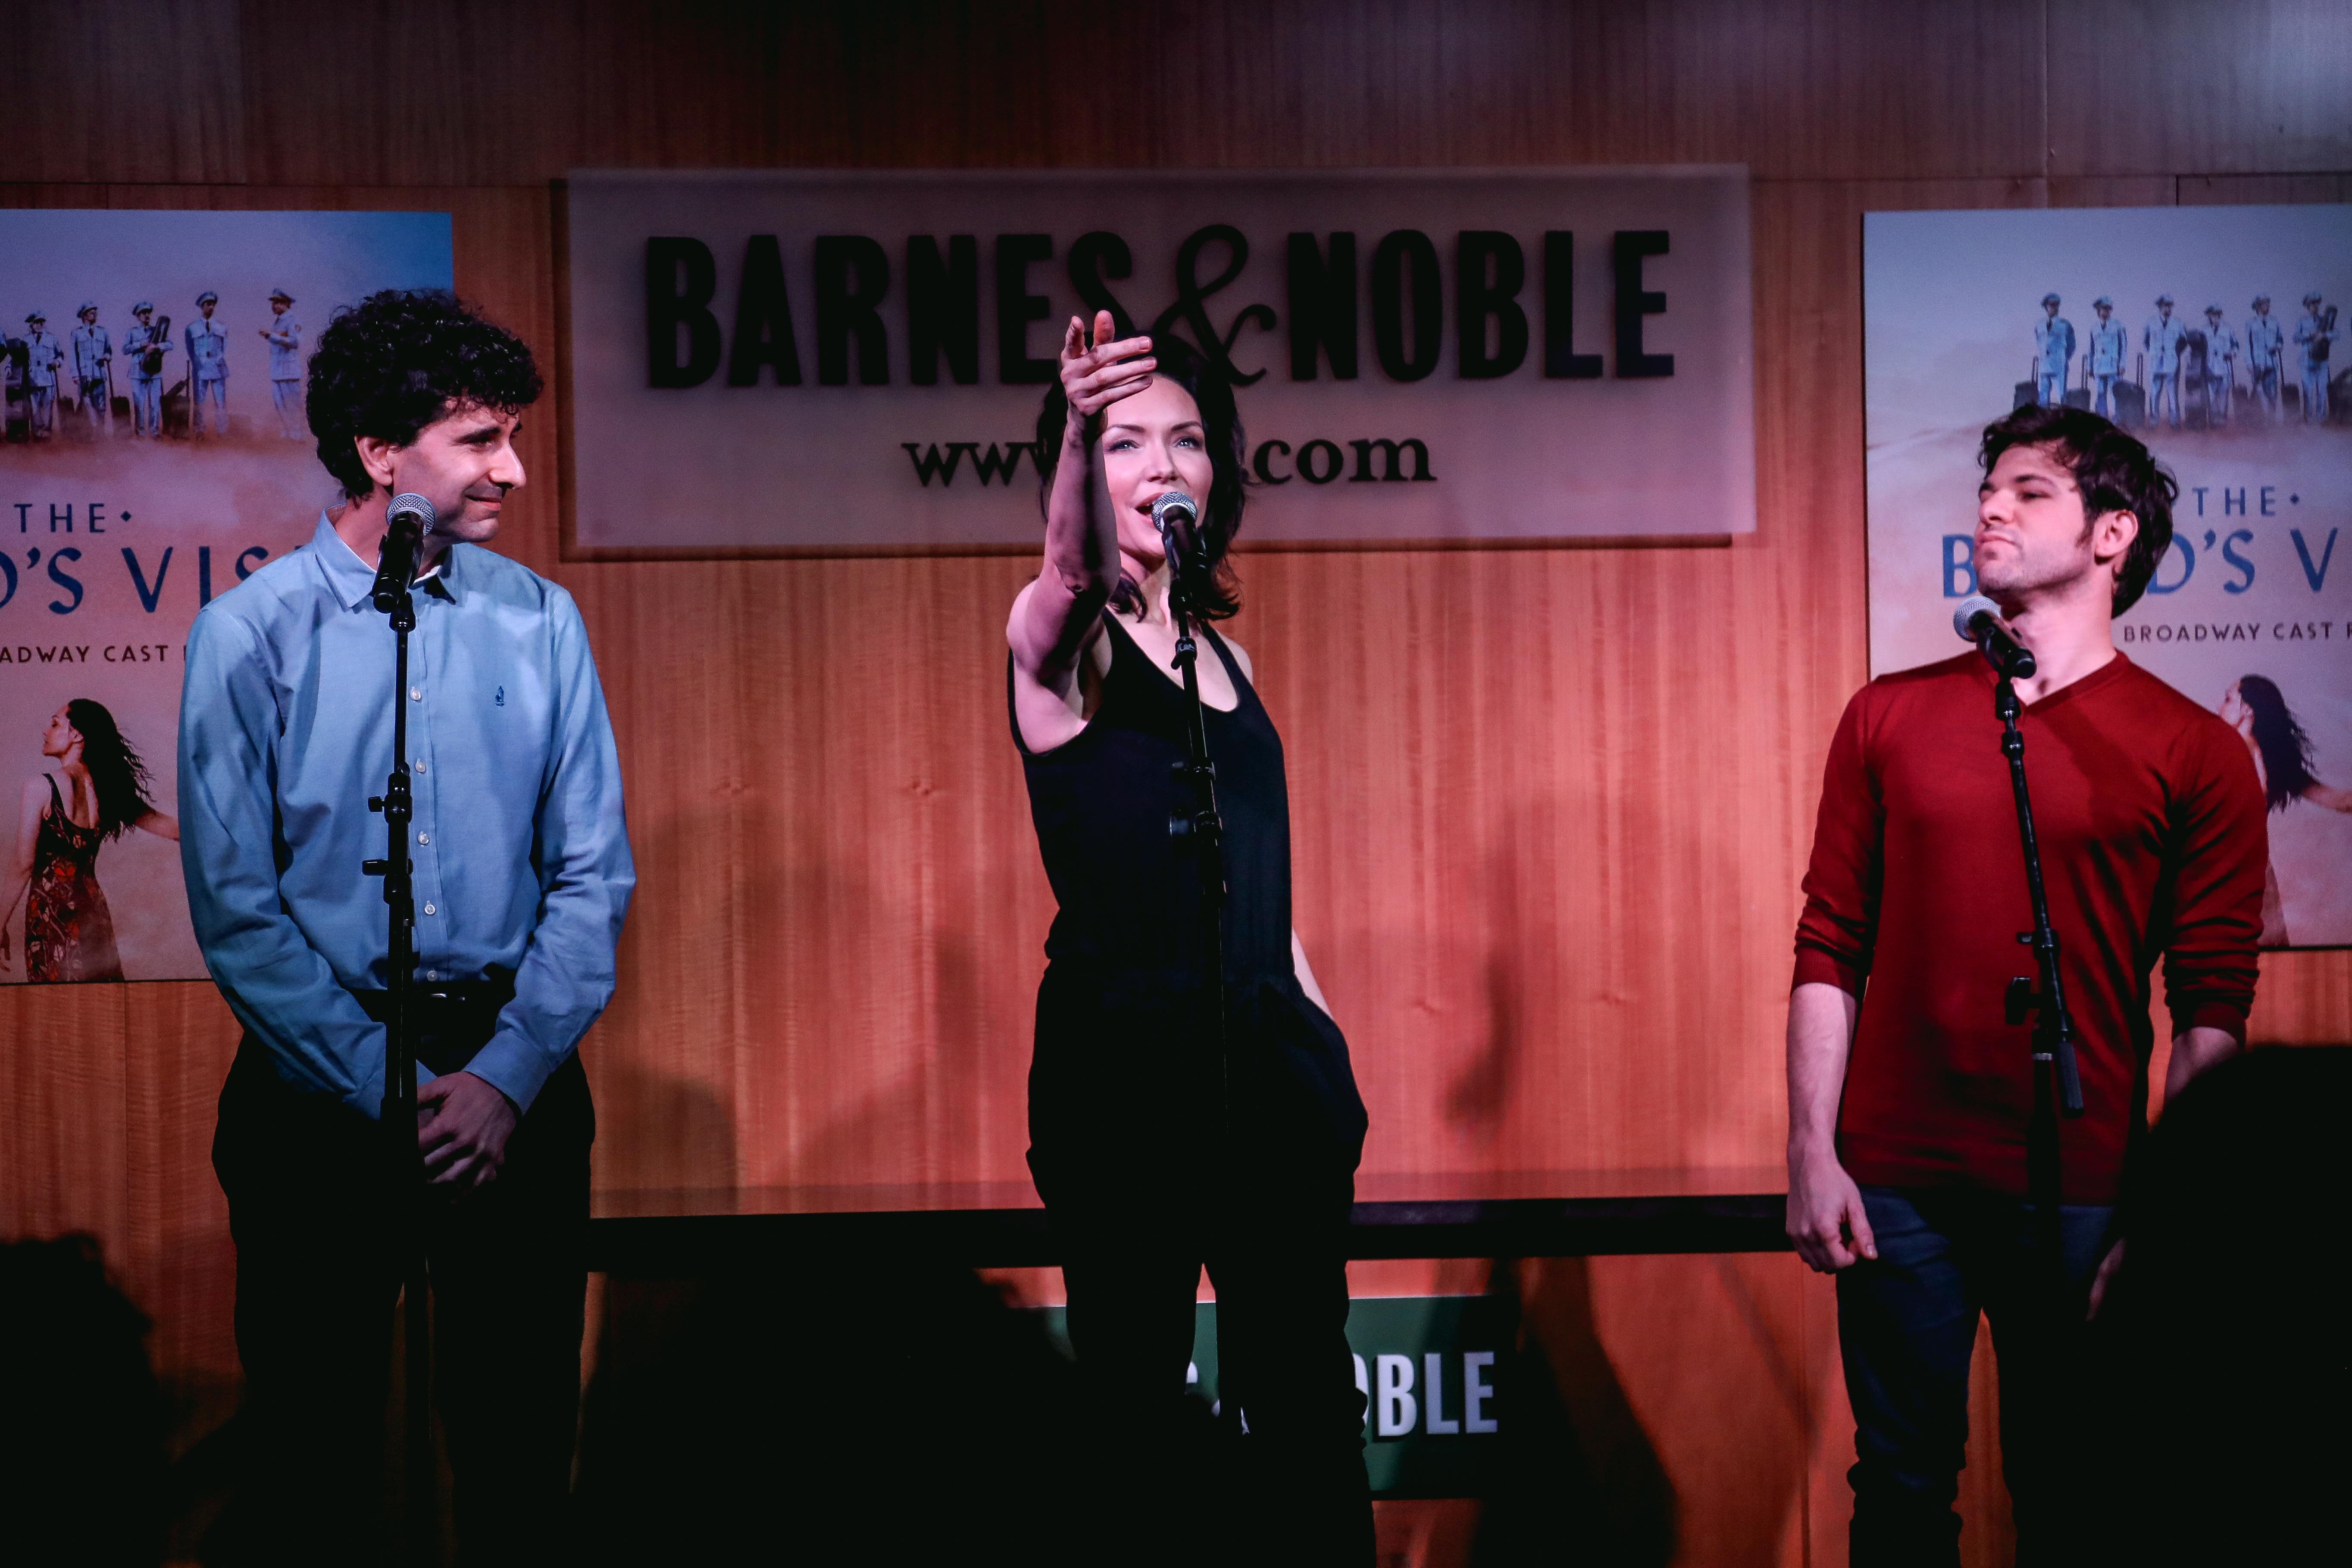 See The Band's Visit Celebrate Original Broadway Cast Album Release